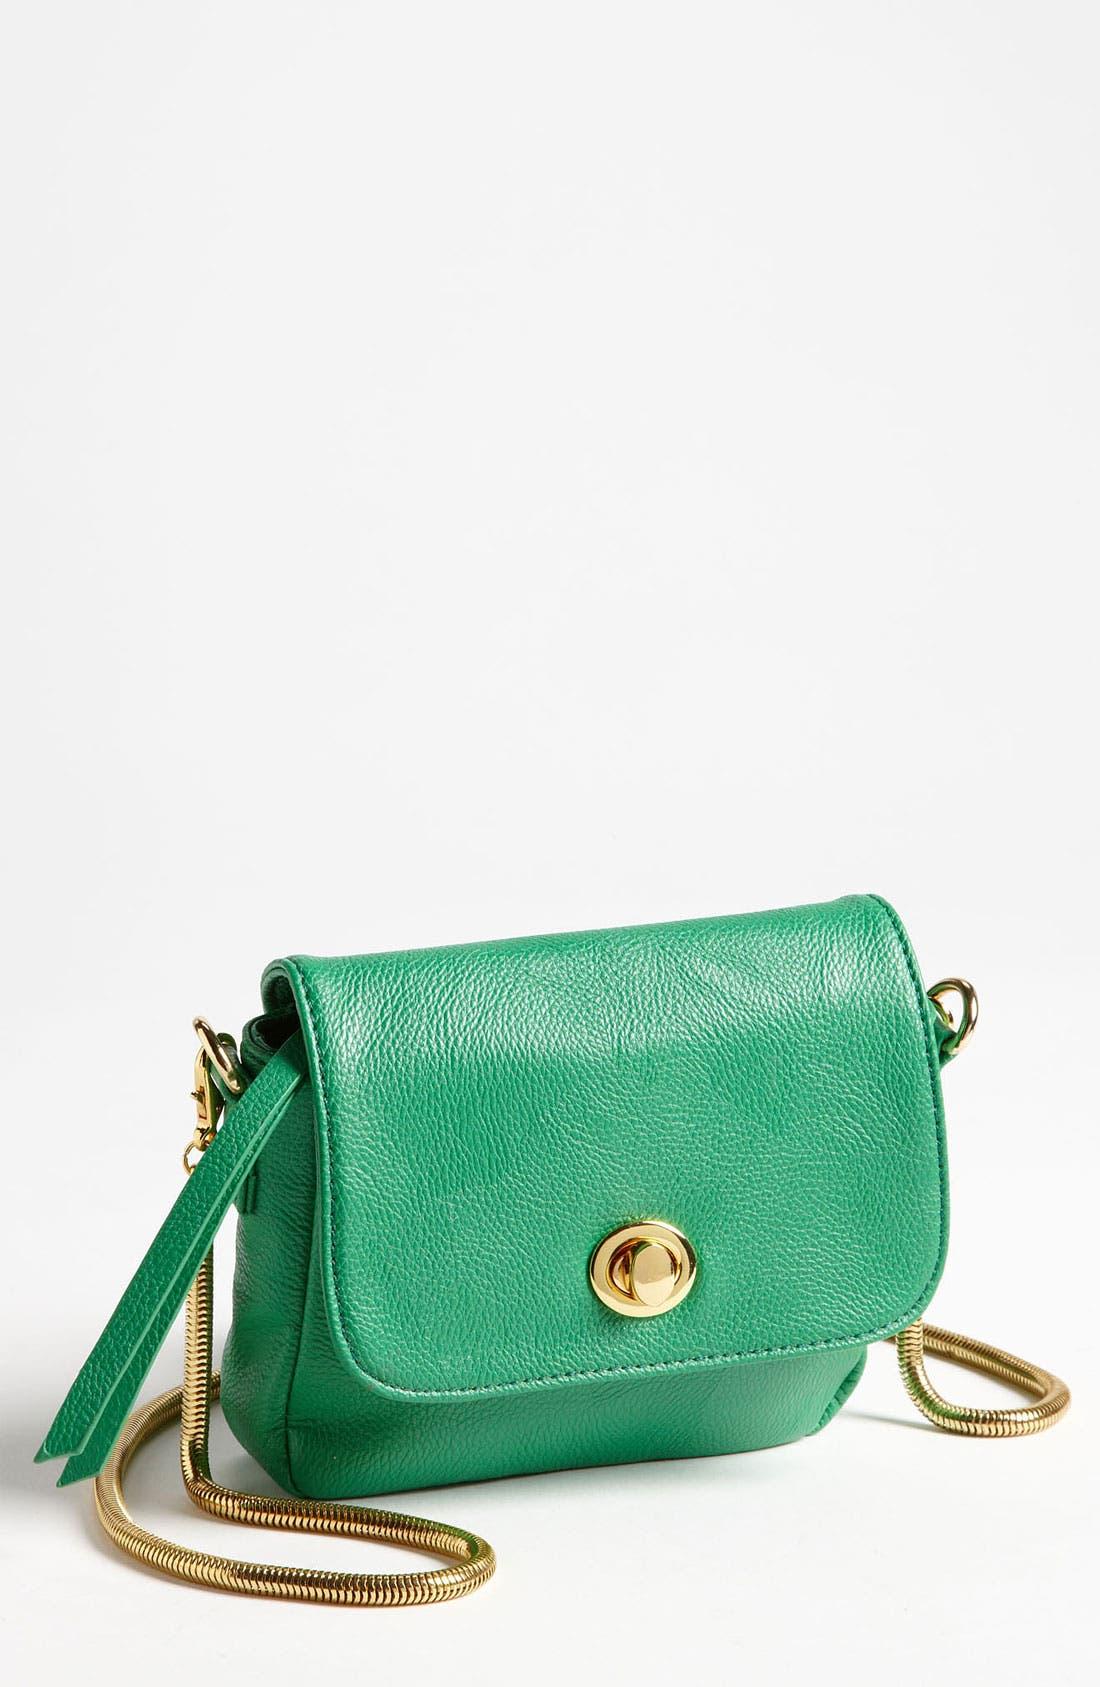 Main Image - Navoh 'Nicky' Crossbody Bag